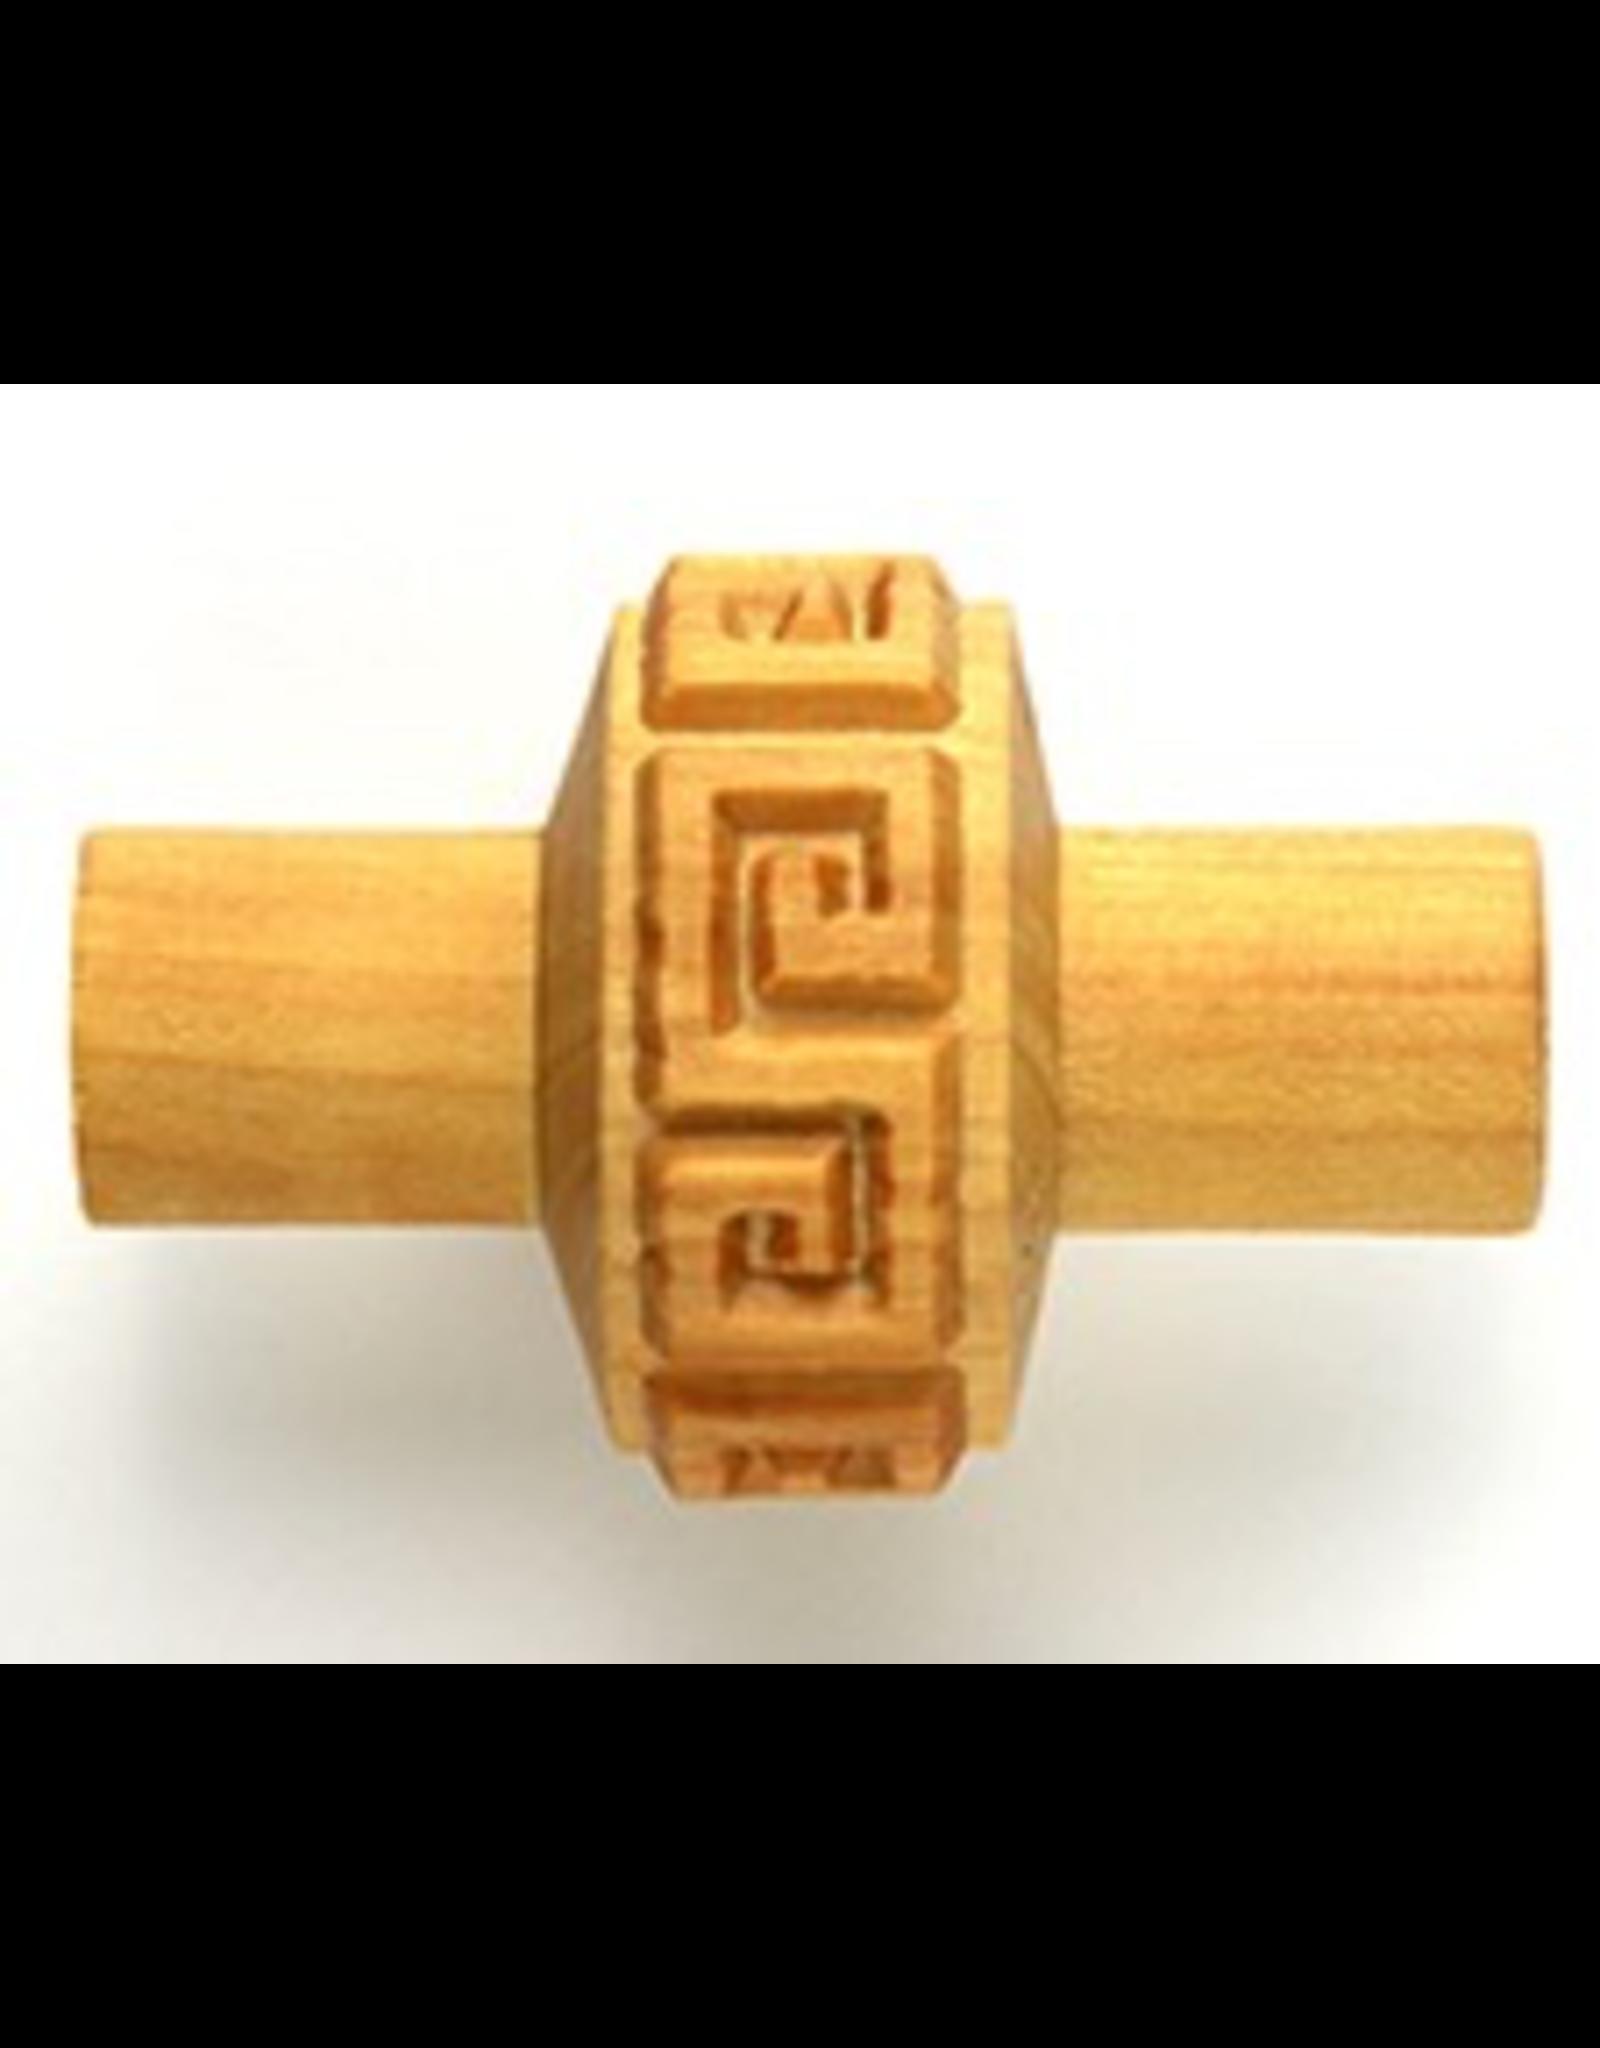 MKM tools Impressed Greek key pattern roller